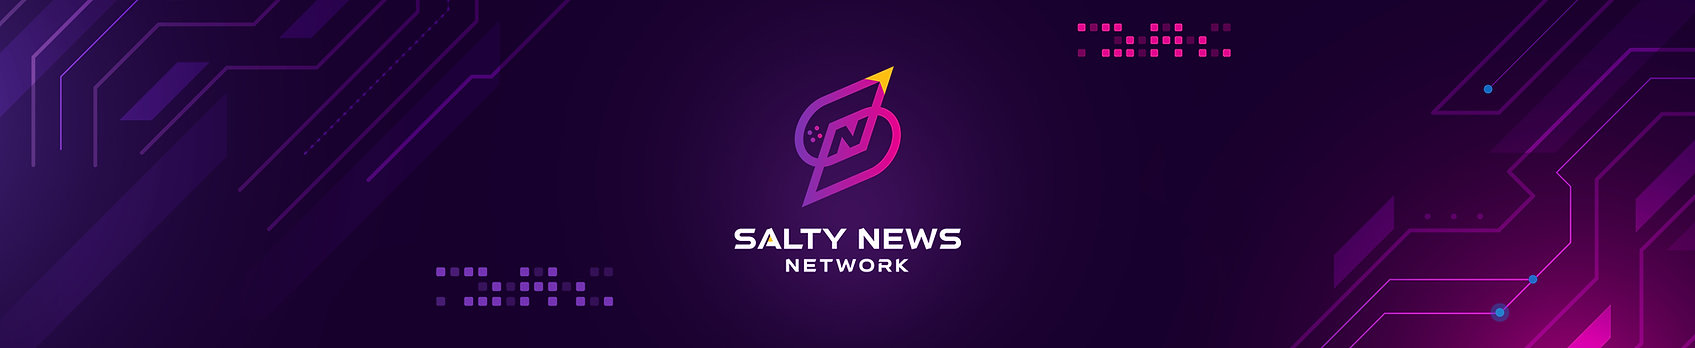 Salty News Network_WEBSITE COVER.jpg